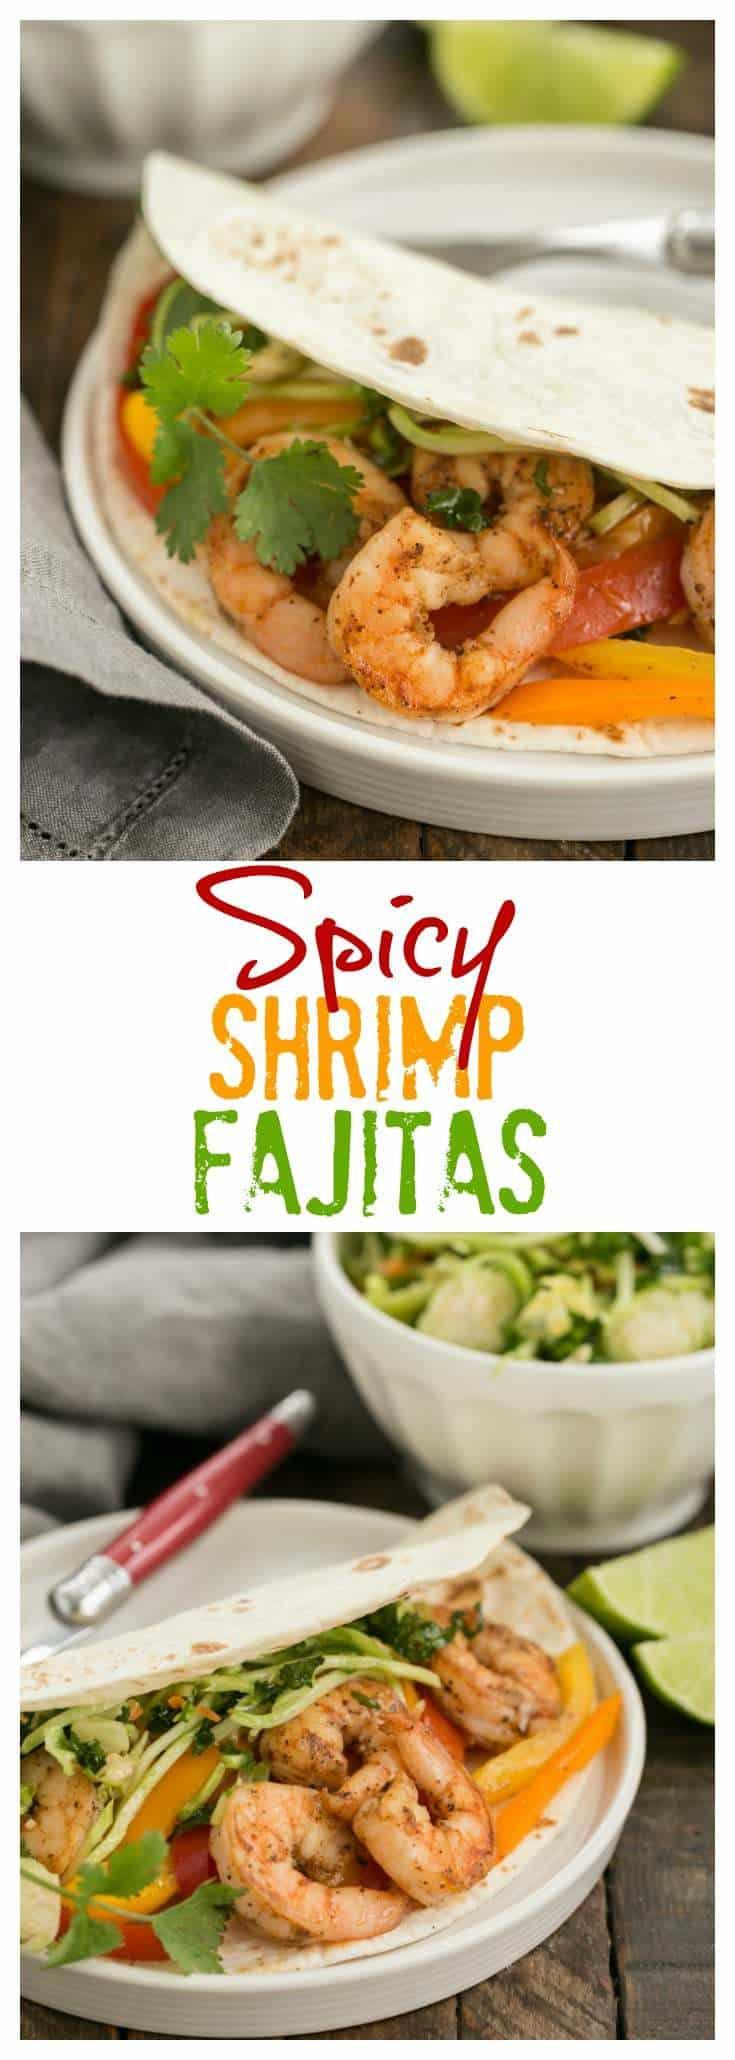 Spicy Shrimp Fajitas - an easy seafood recipe with a southwest flair #texmex #fajitas #shrimp